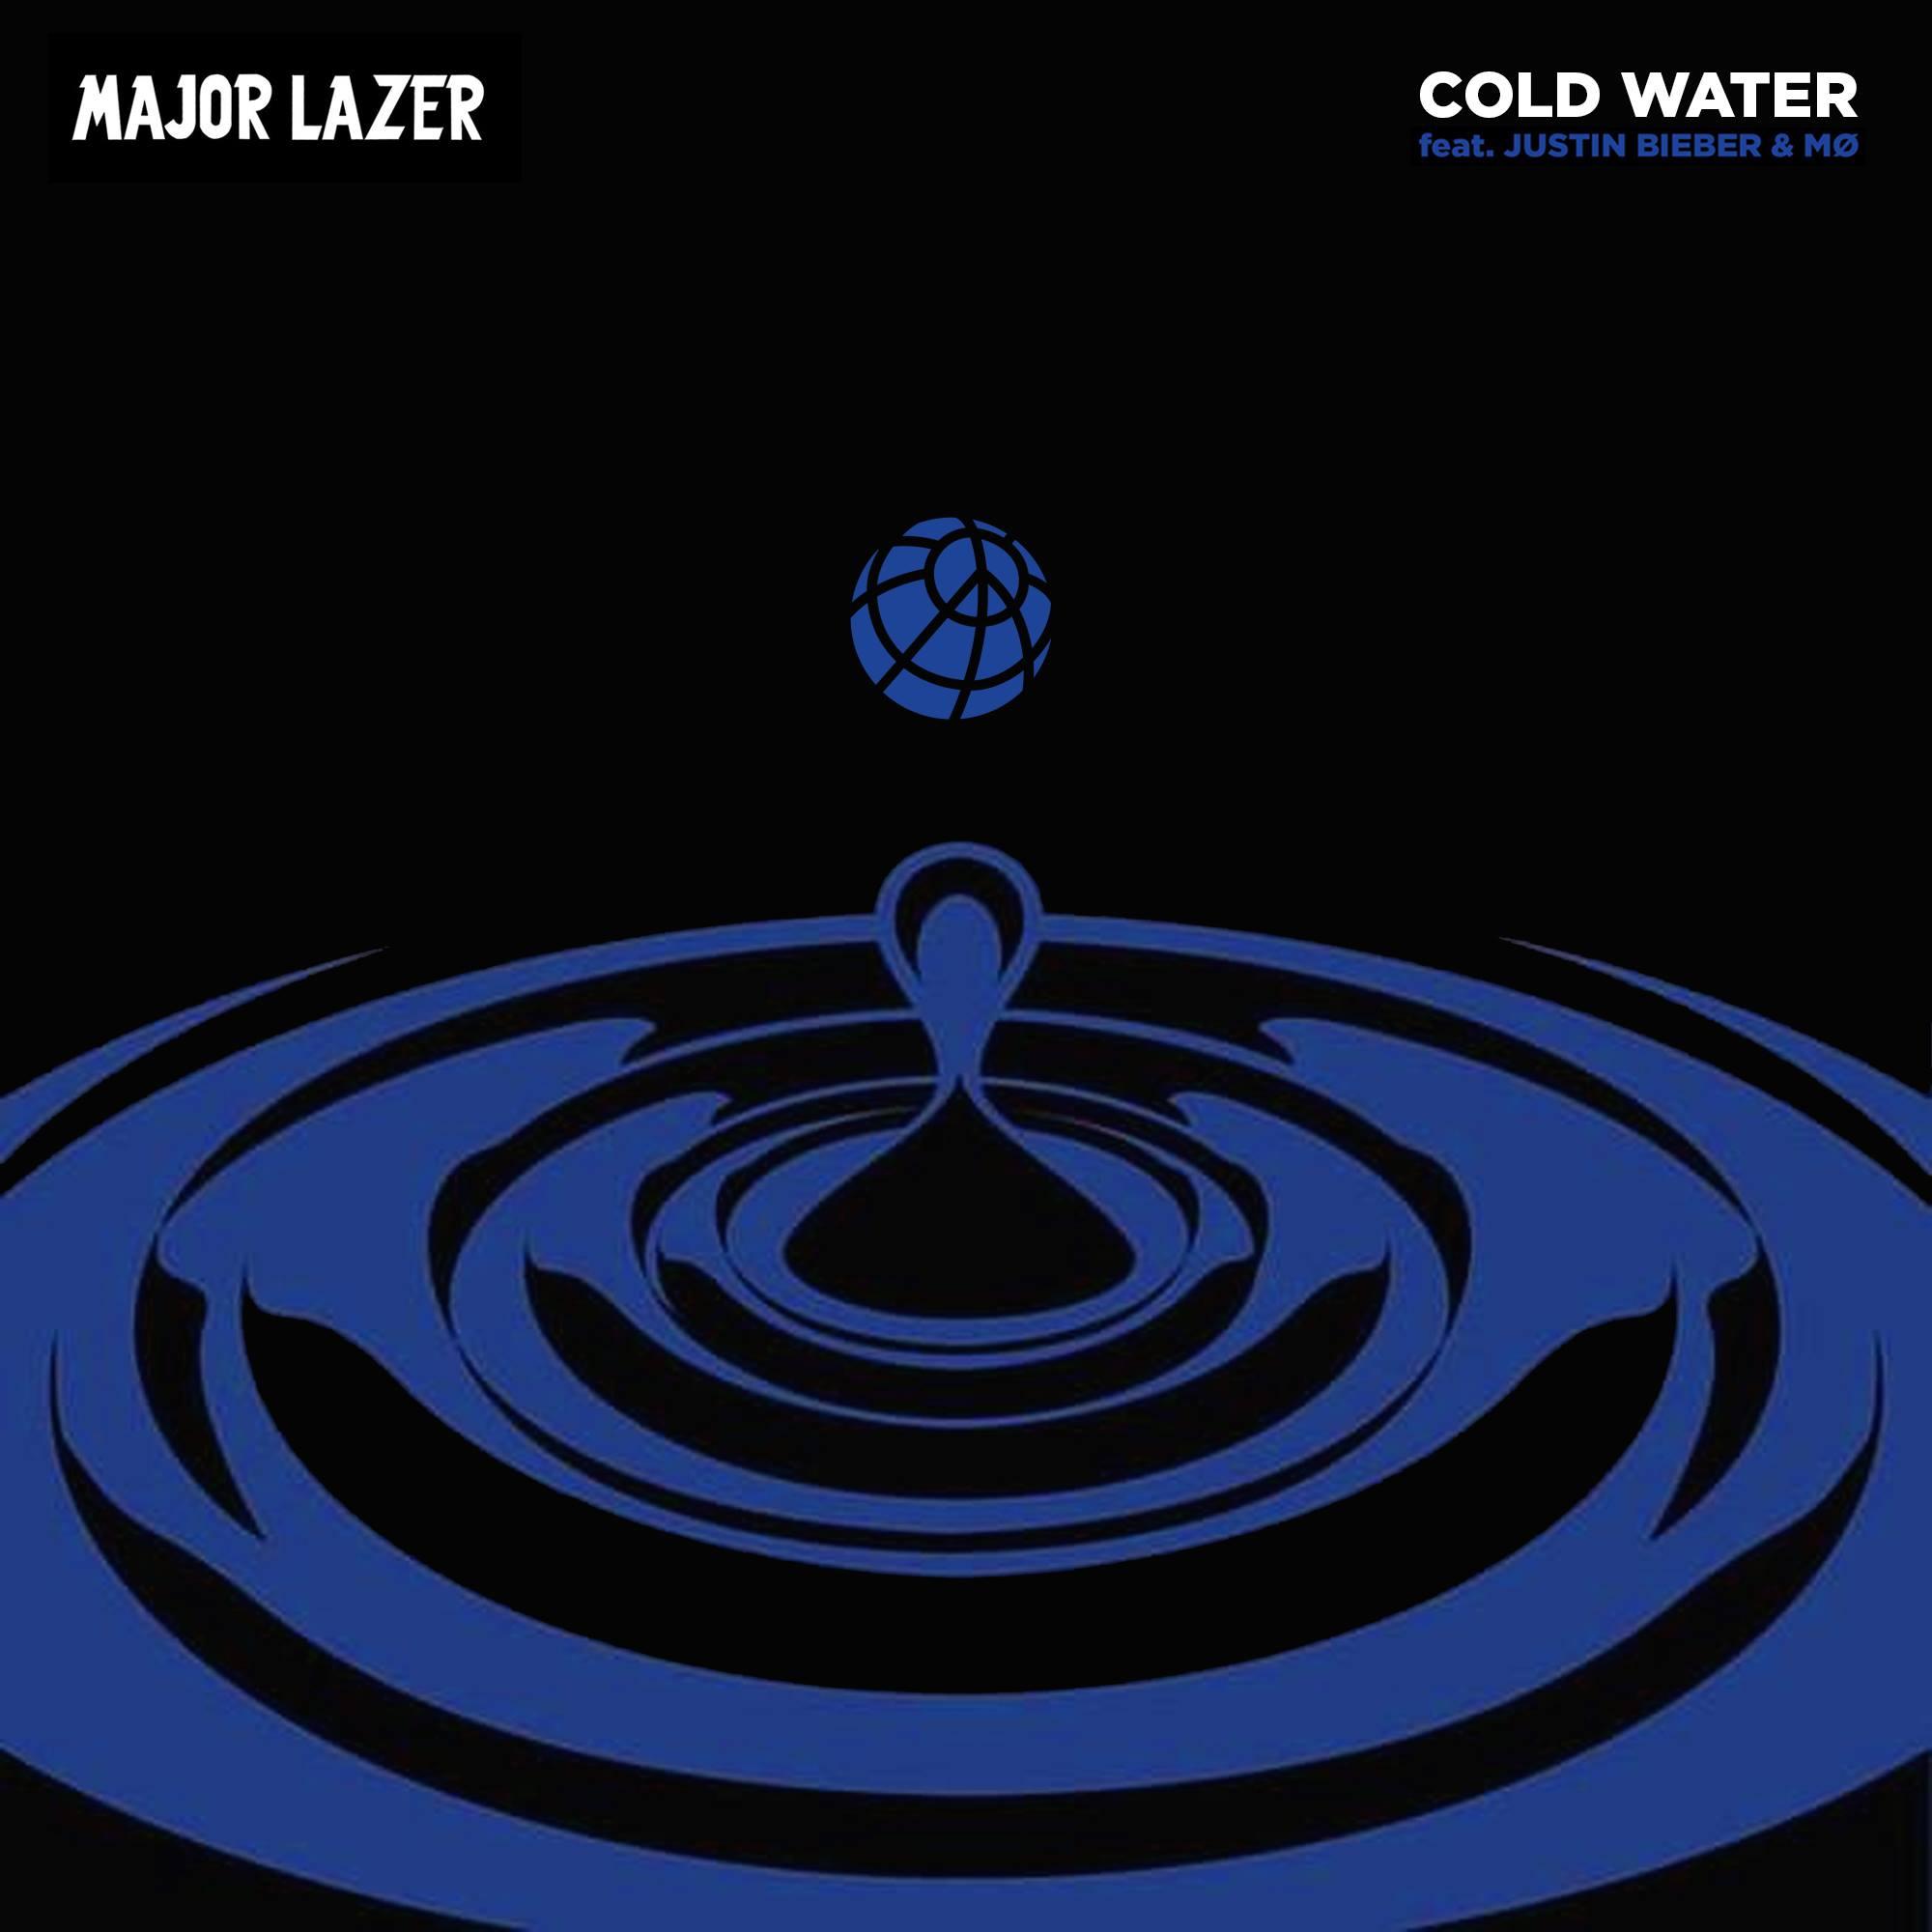 Major-Lazer-Cold-Water-2016-2000x2000.jpg